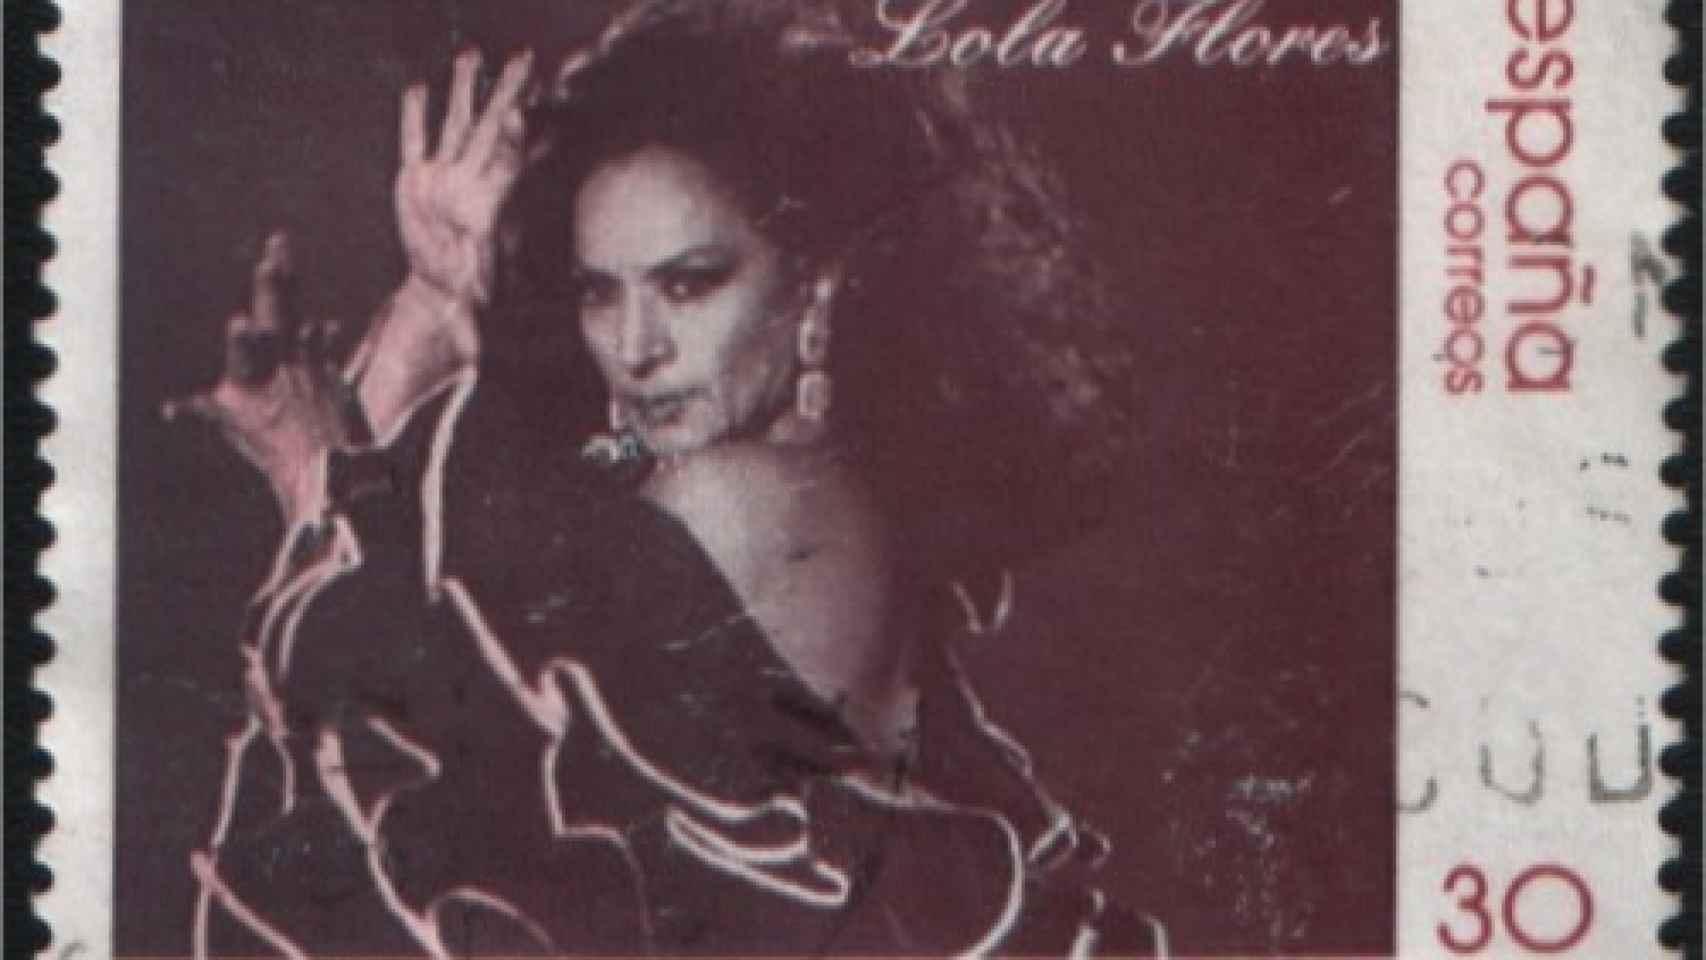 Sello homenaje a Lola Flores